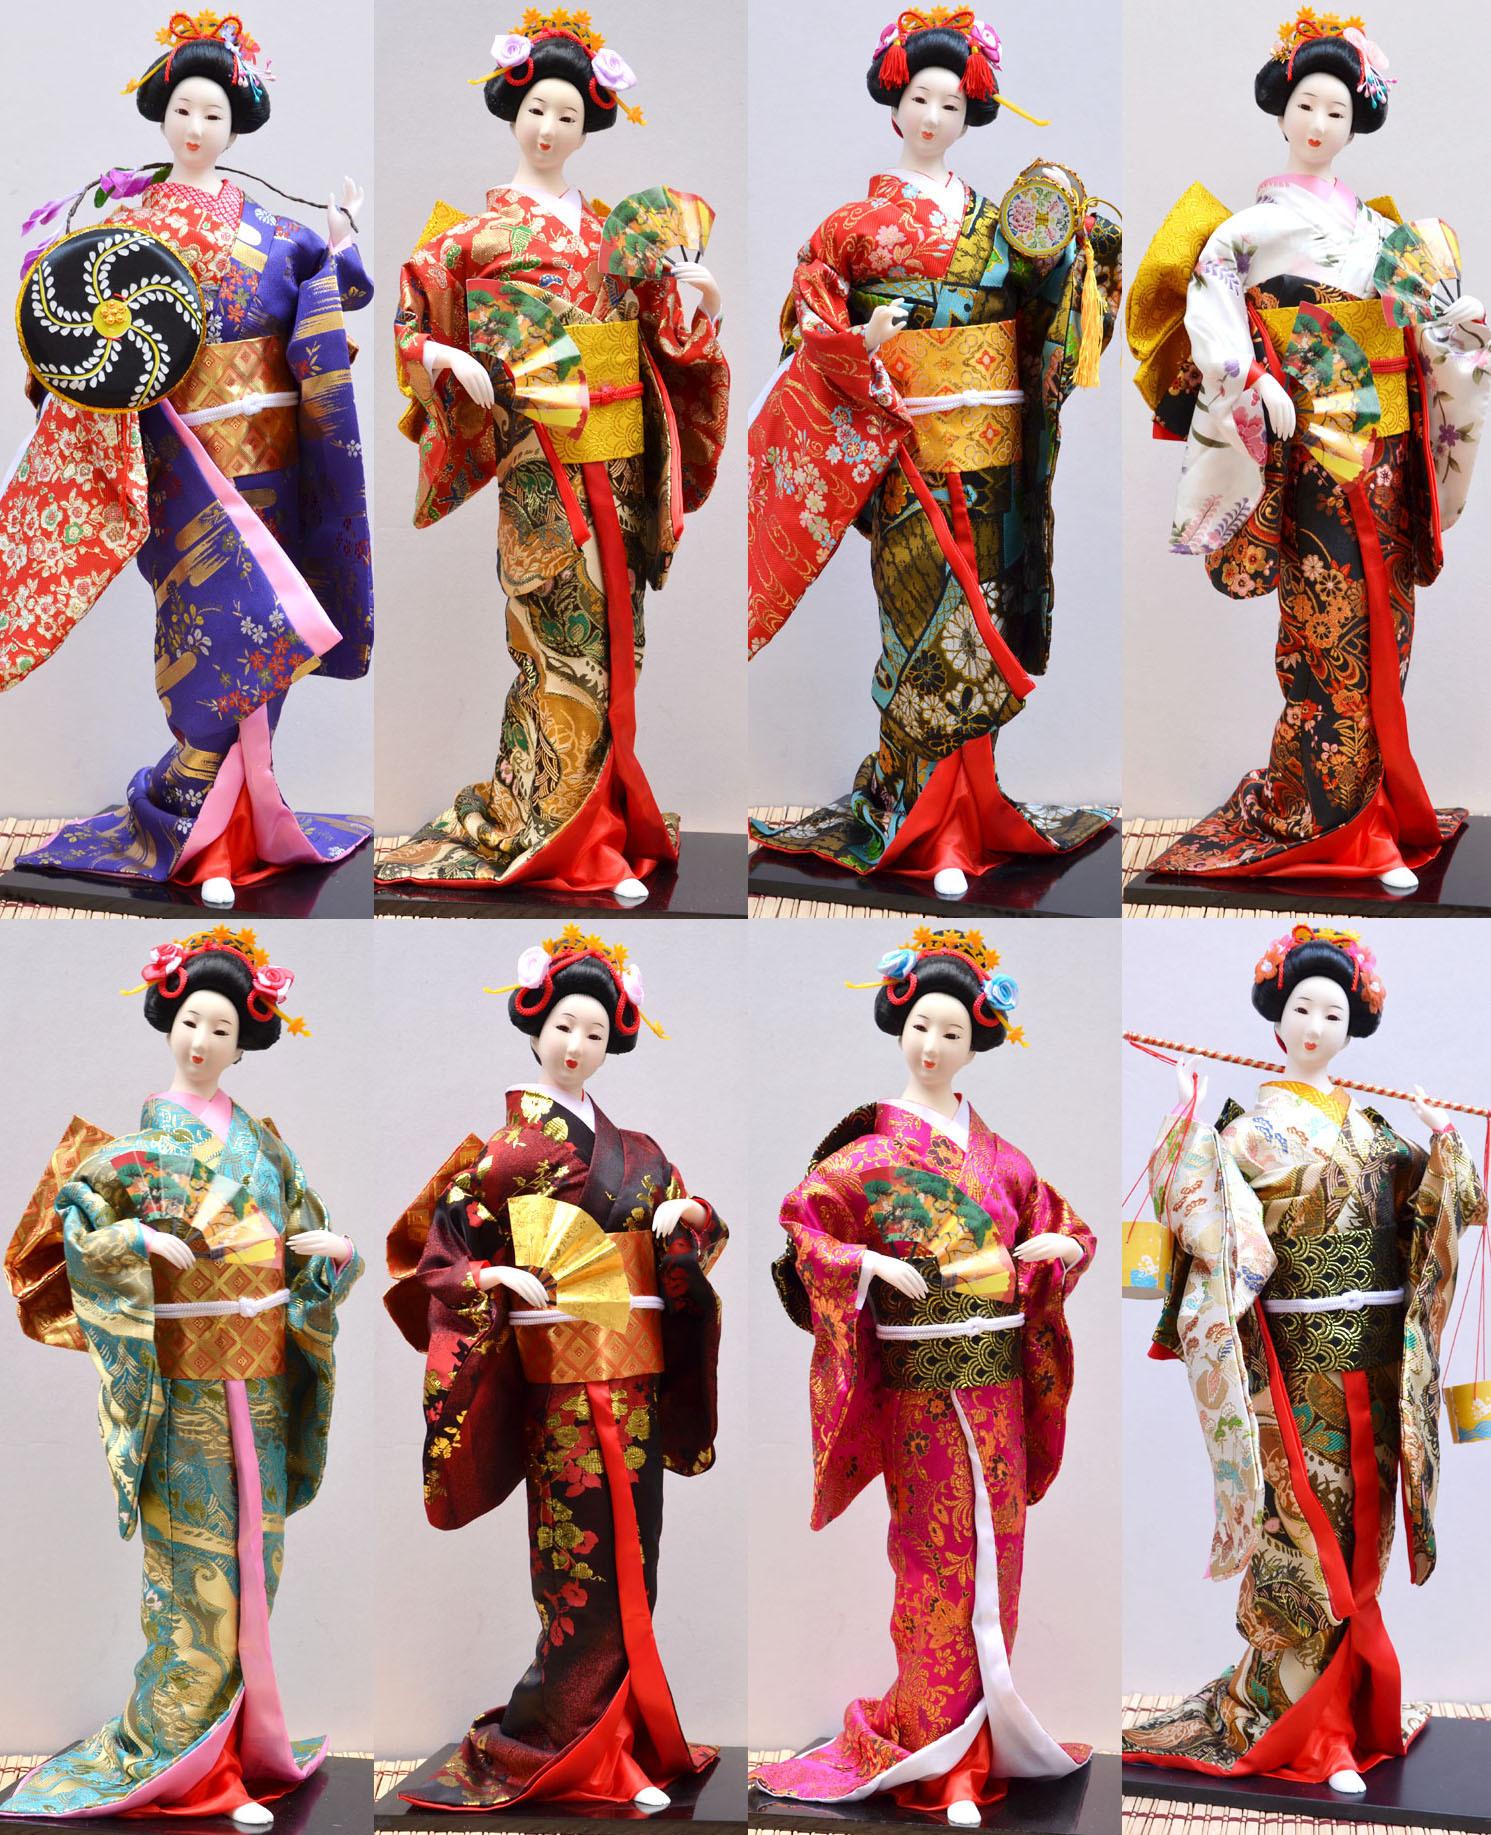 55CM日本人偶娃娃艺妓歌舞伎摆件酒店装饰品手工民间工艺品批发